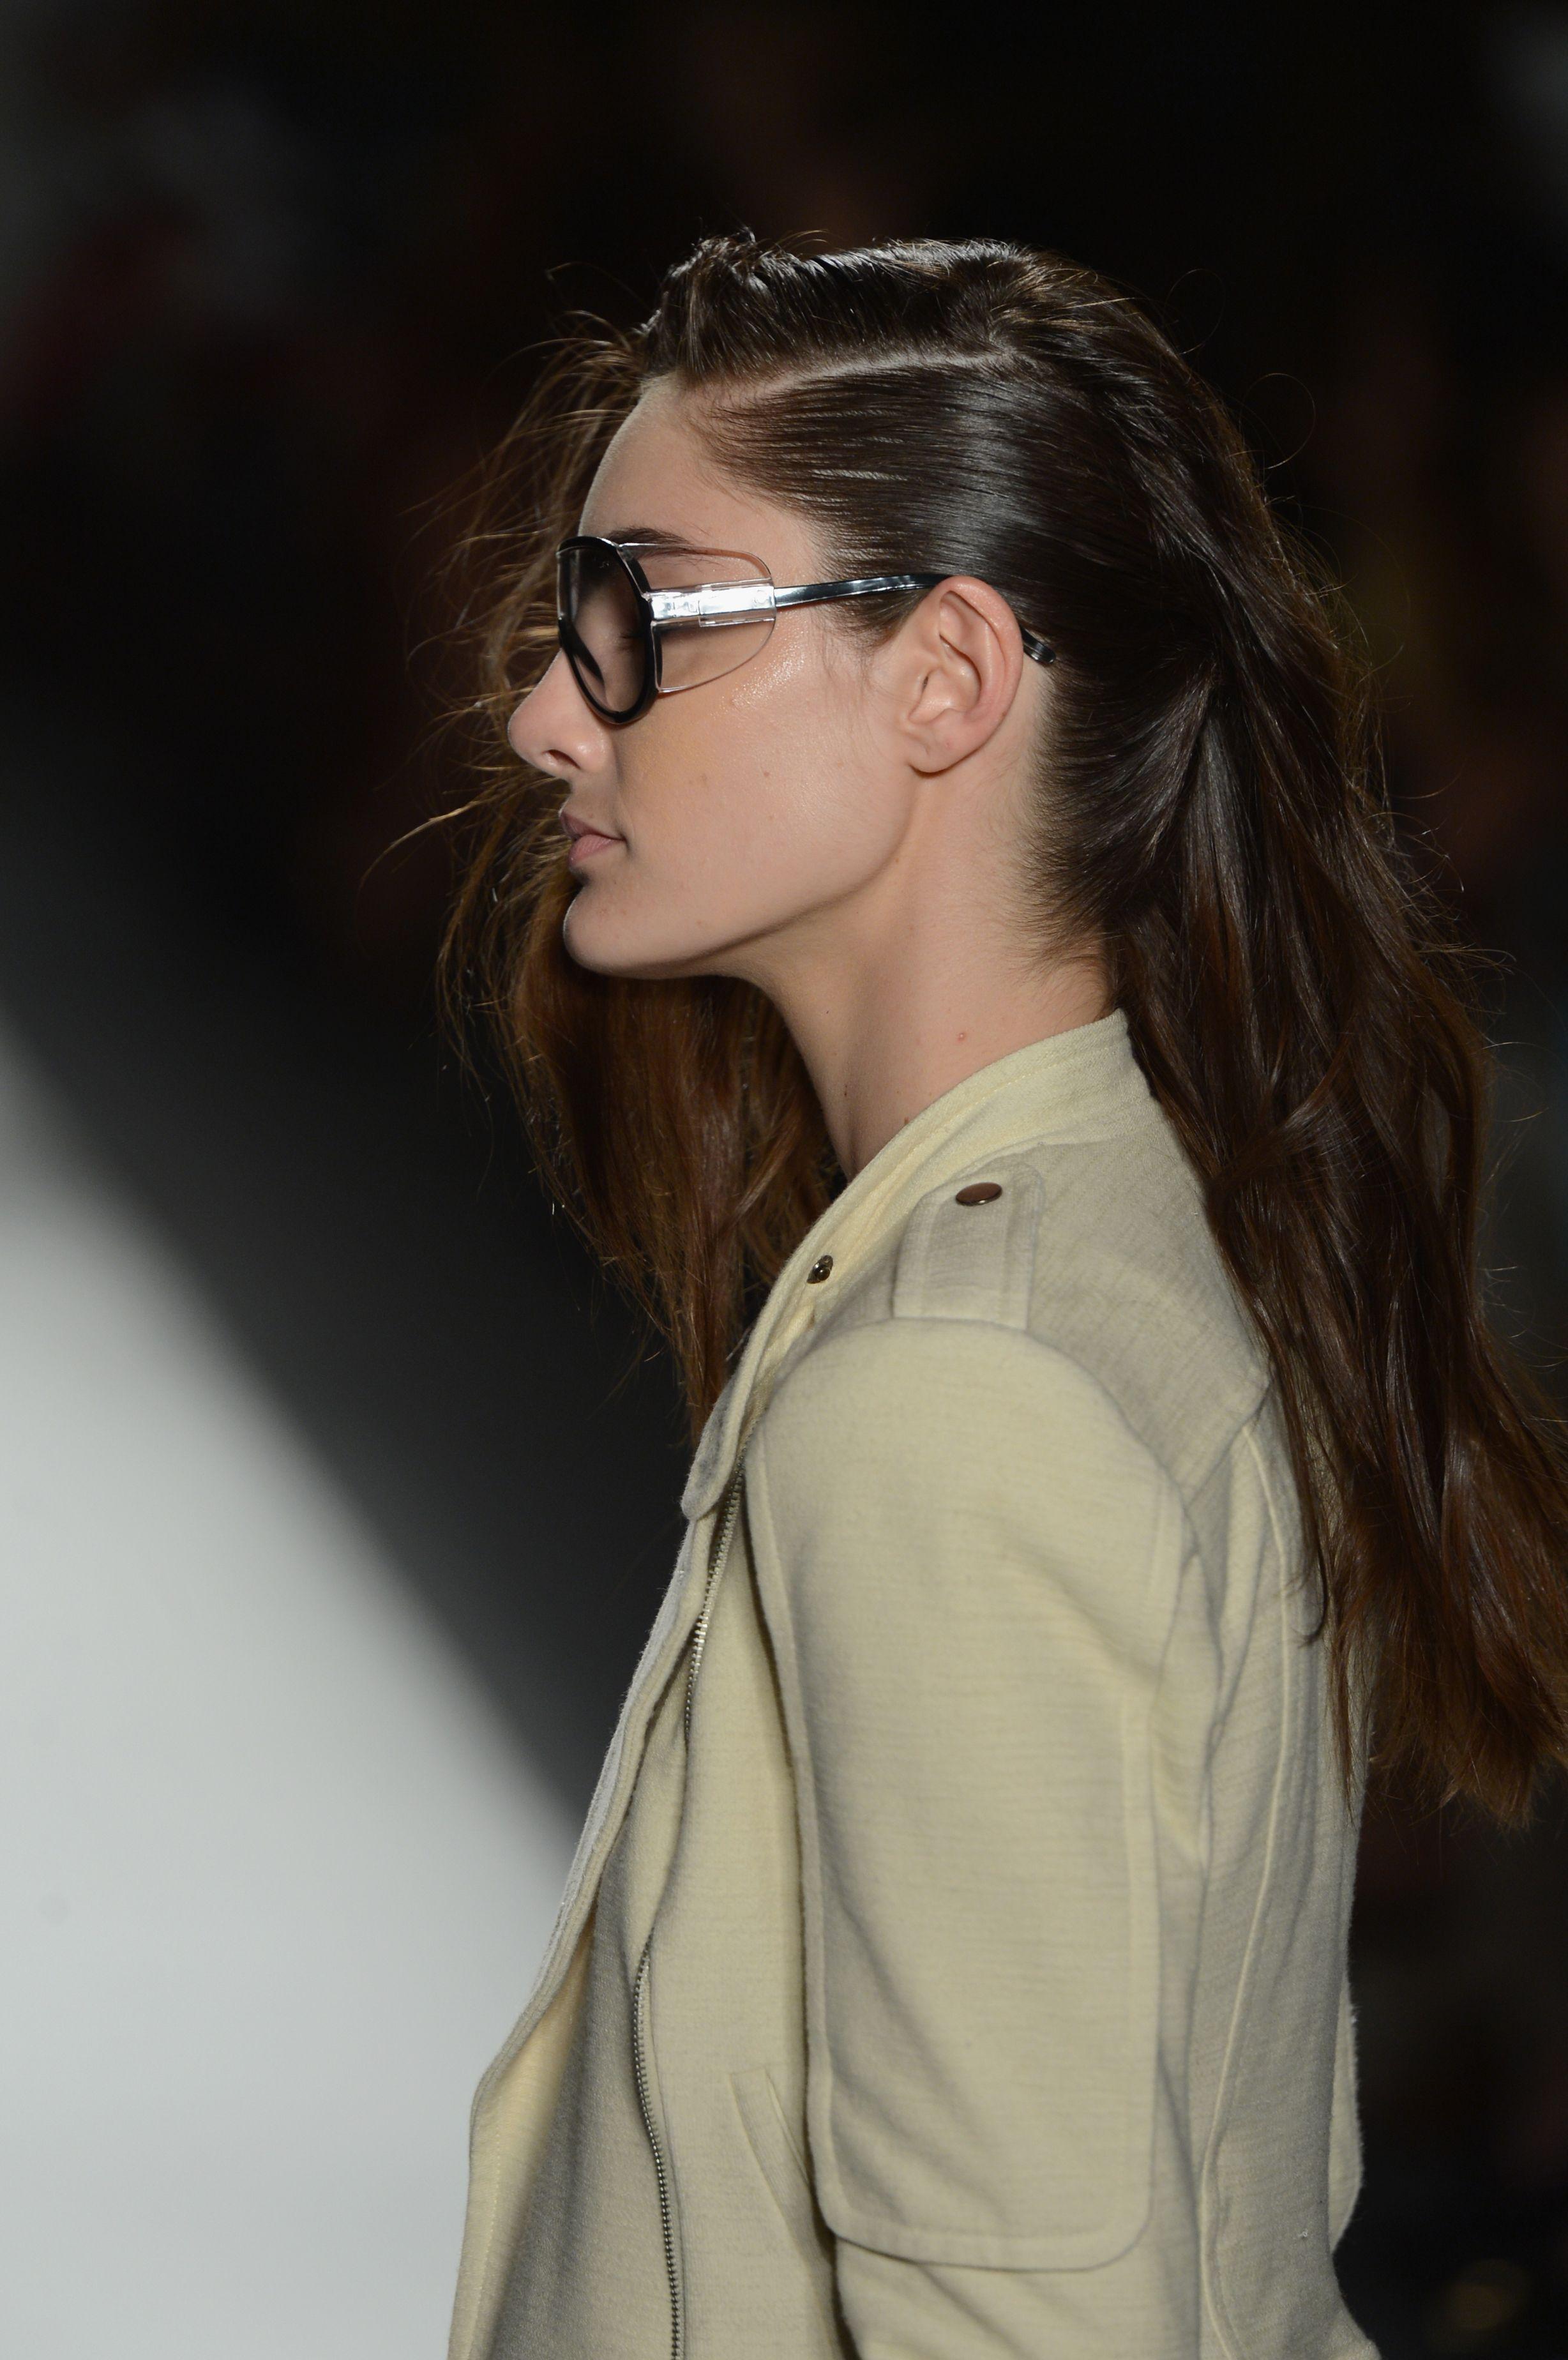 Tracy Reese Spring 2013 Show, Hair by TRESemme #tracyreese #spring2013 #tresemme #tresmbfw @Mercedes-Benz Fashion Week #mbfw #fashionweek #fashion #models #nyc #newyork #designer